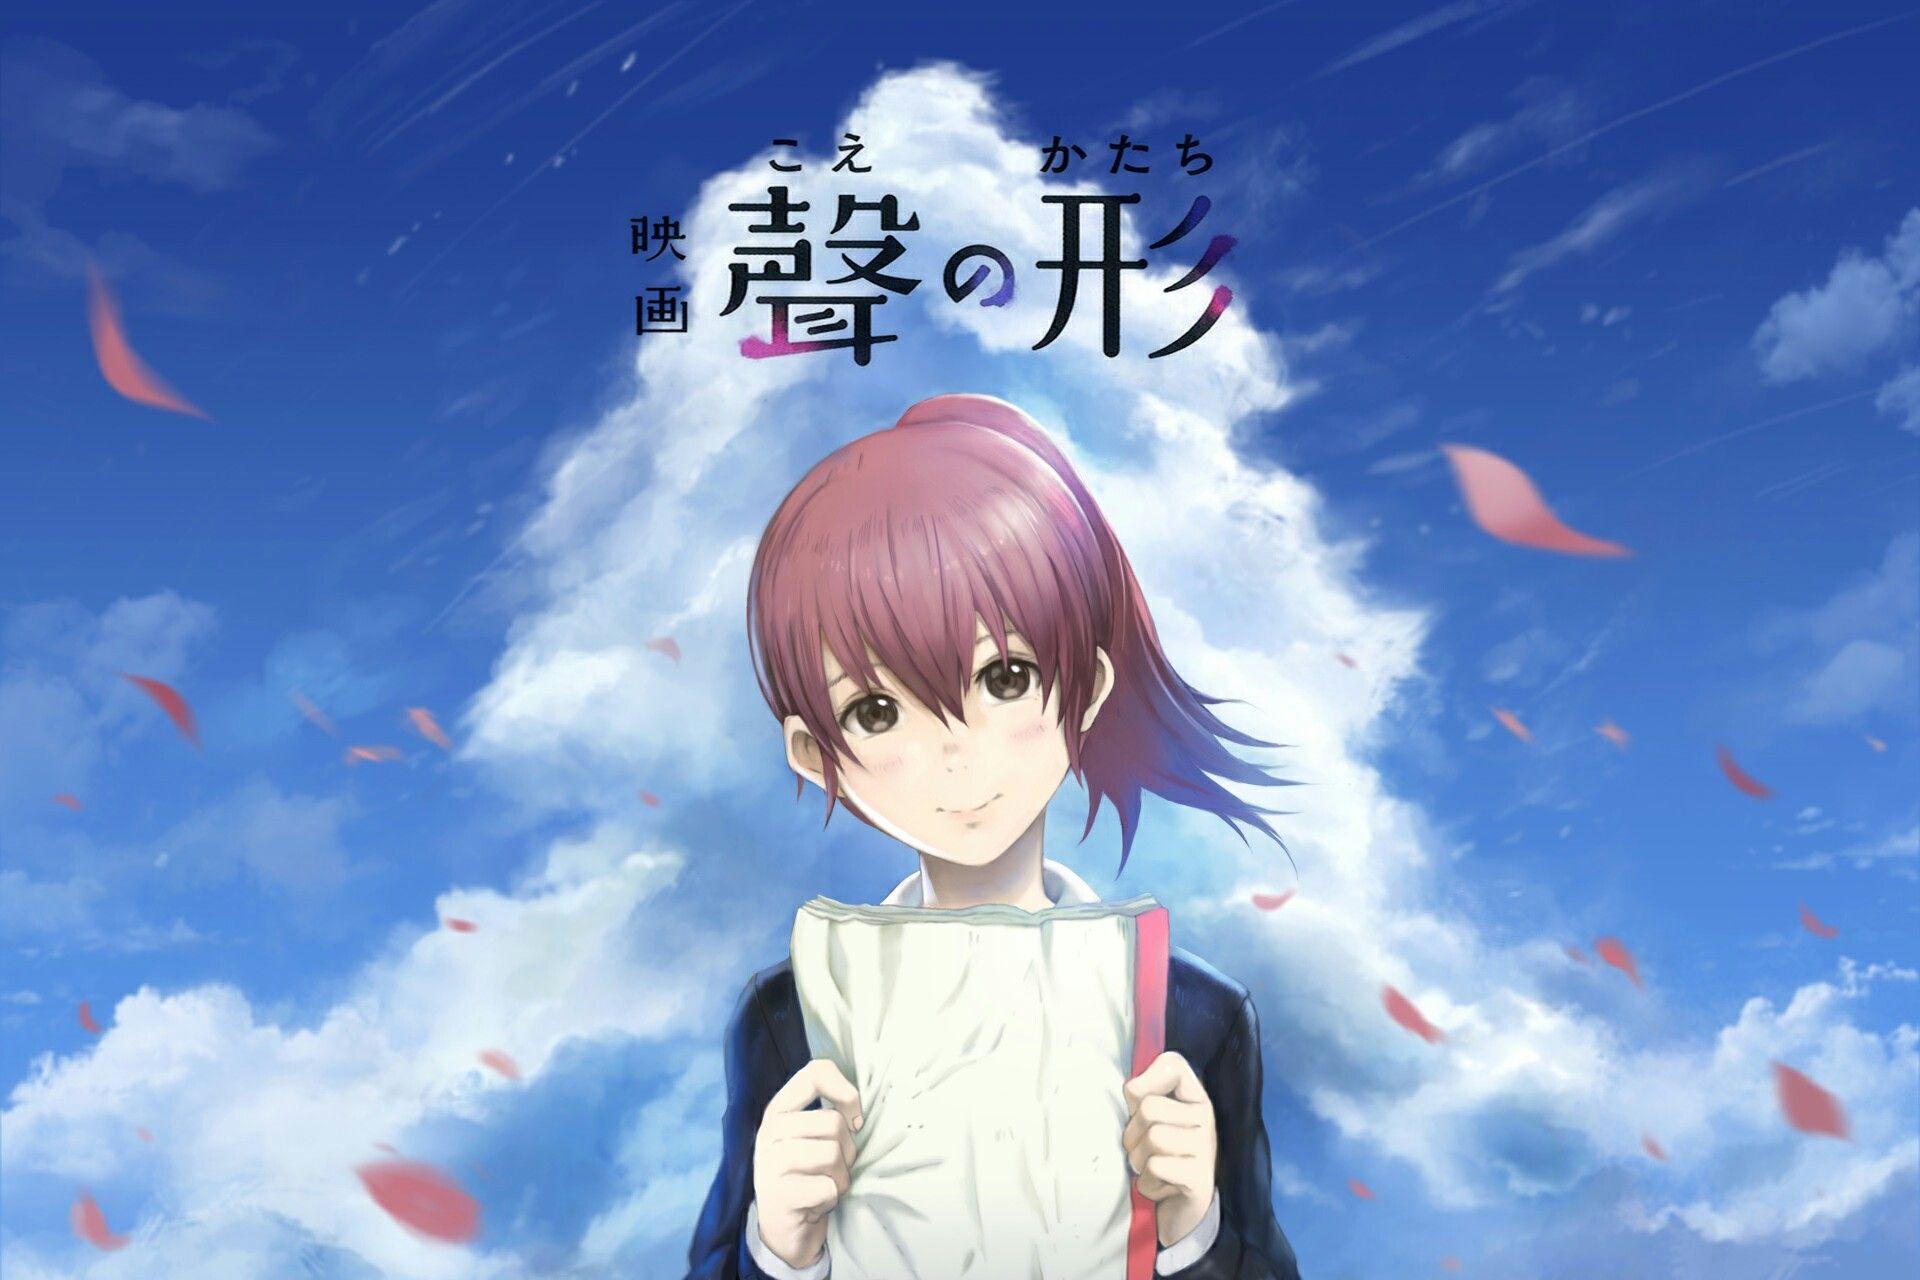 Anime Koe no Katachi. Backgrounds Wallpapers Hình